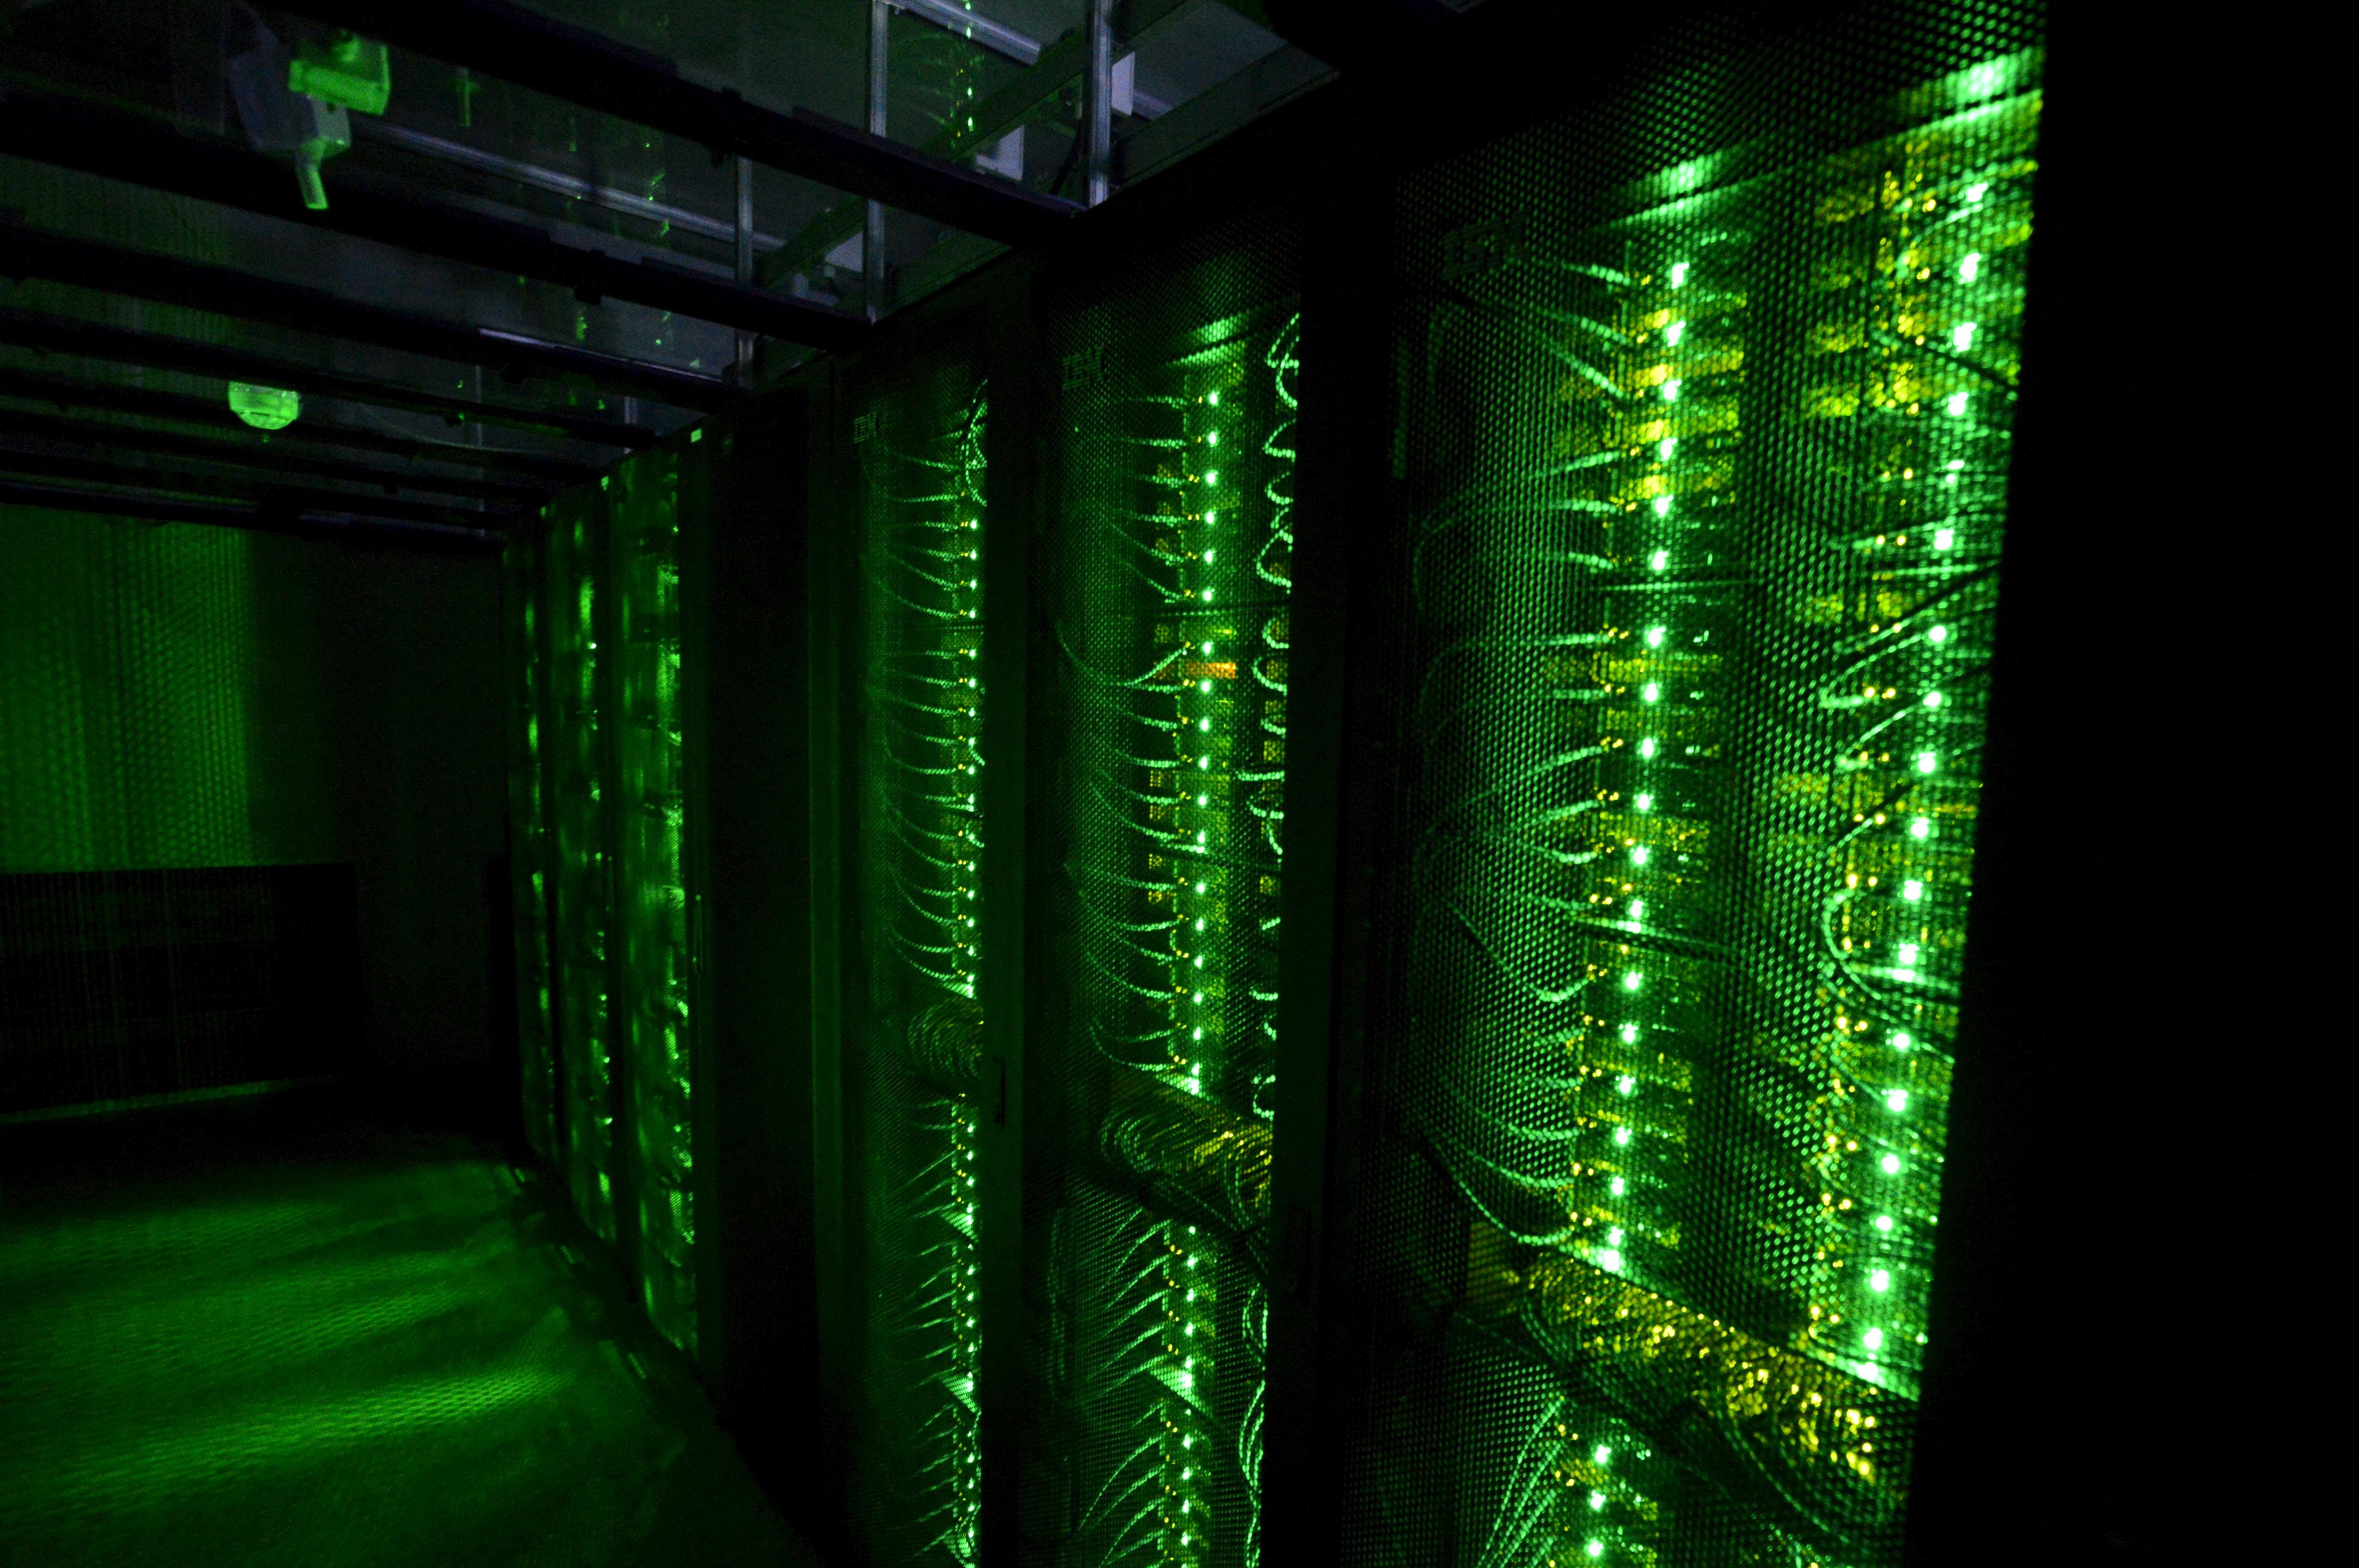 Server farm in Iceland